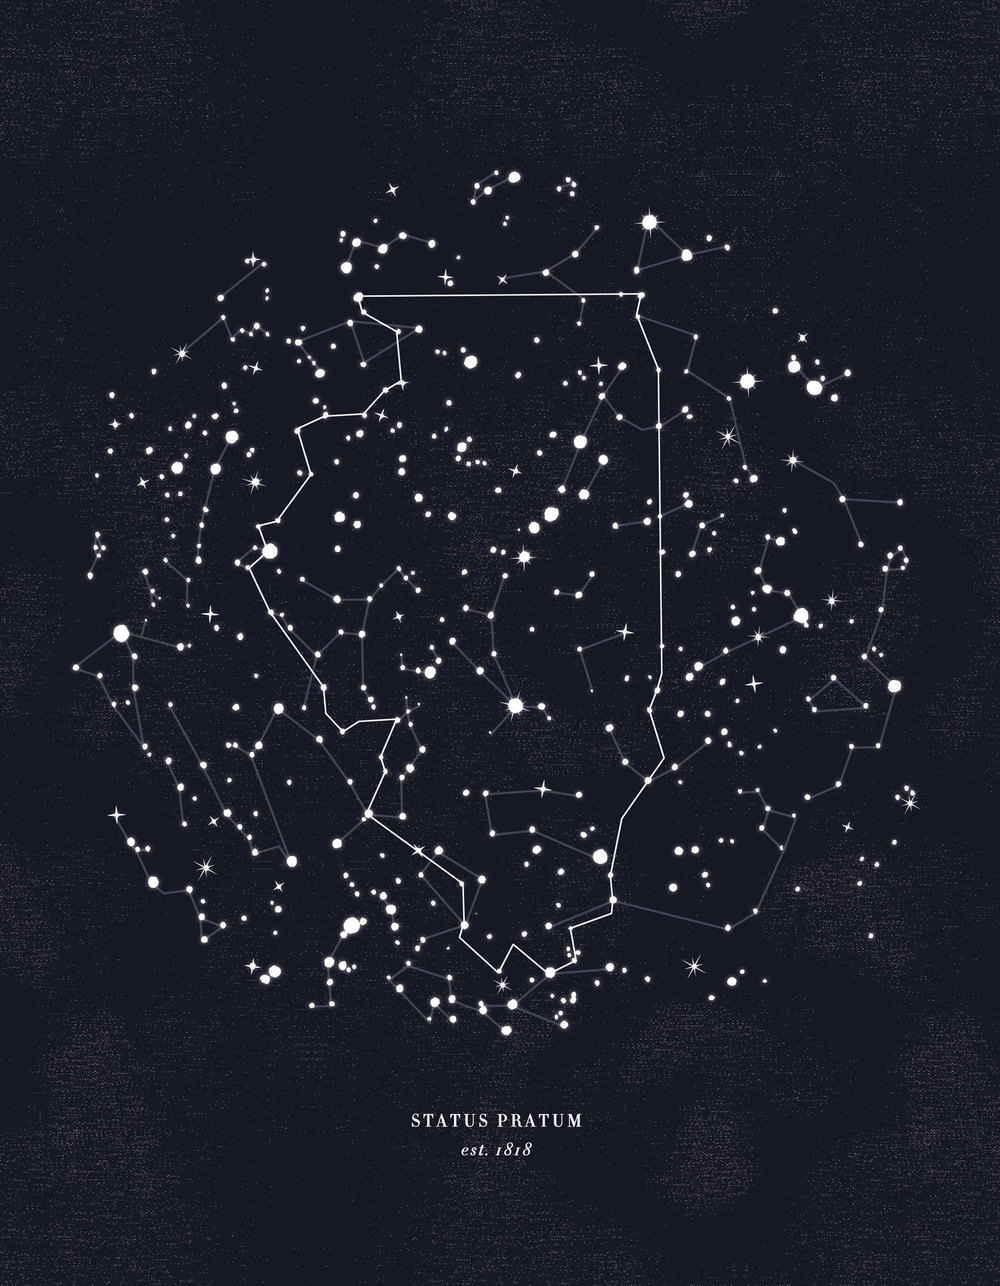 Constellation_Illinois_1500w.jpg